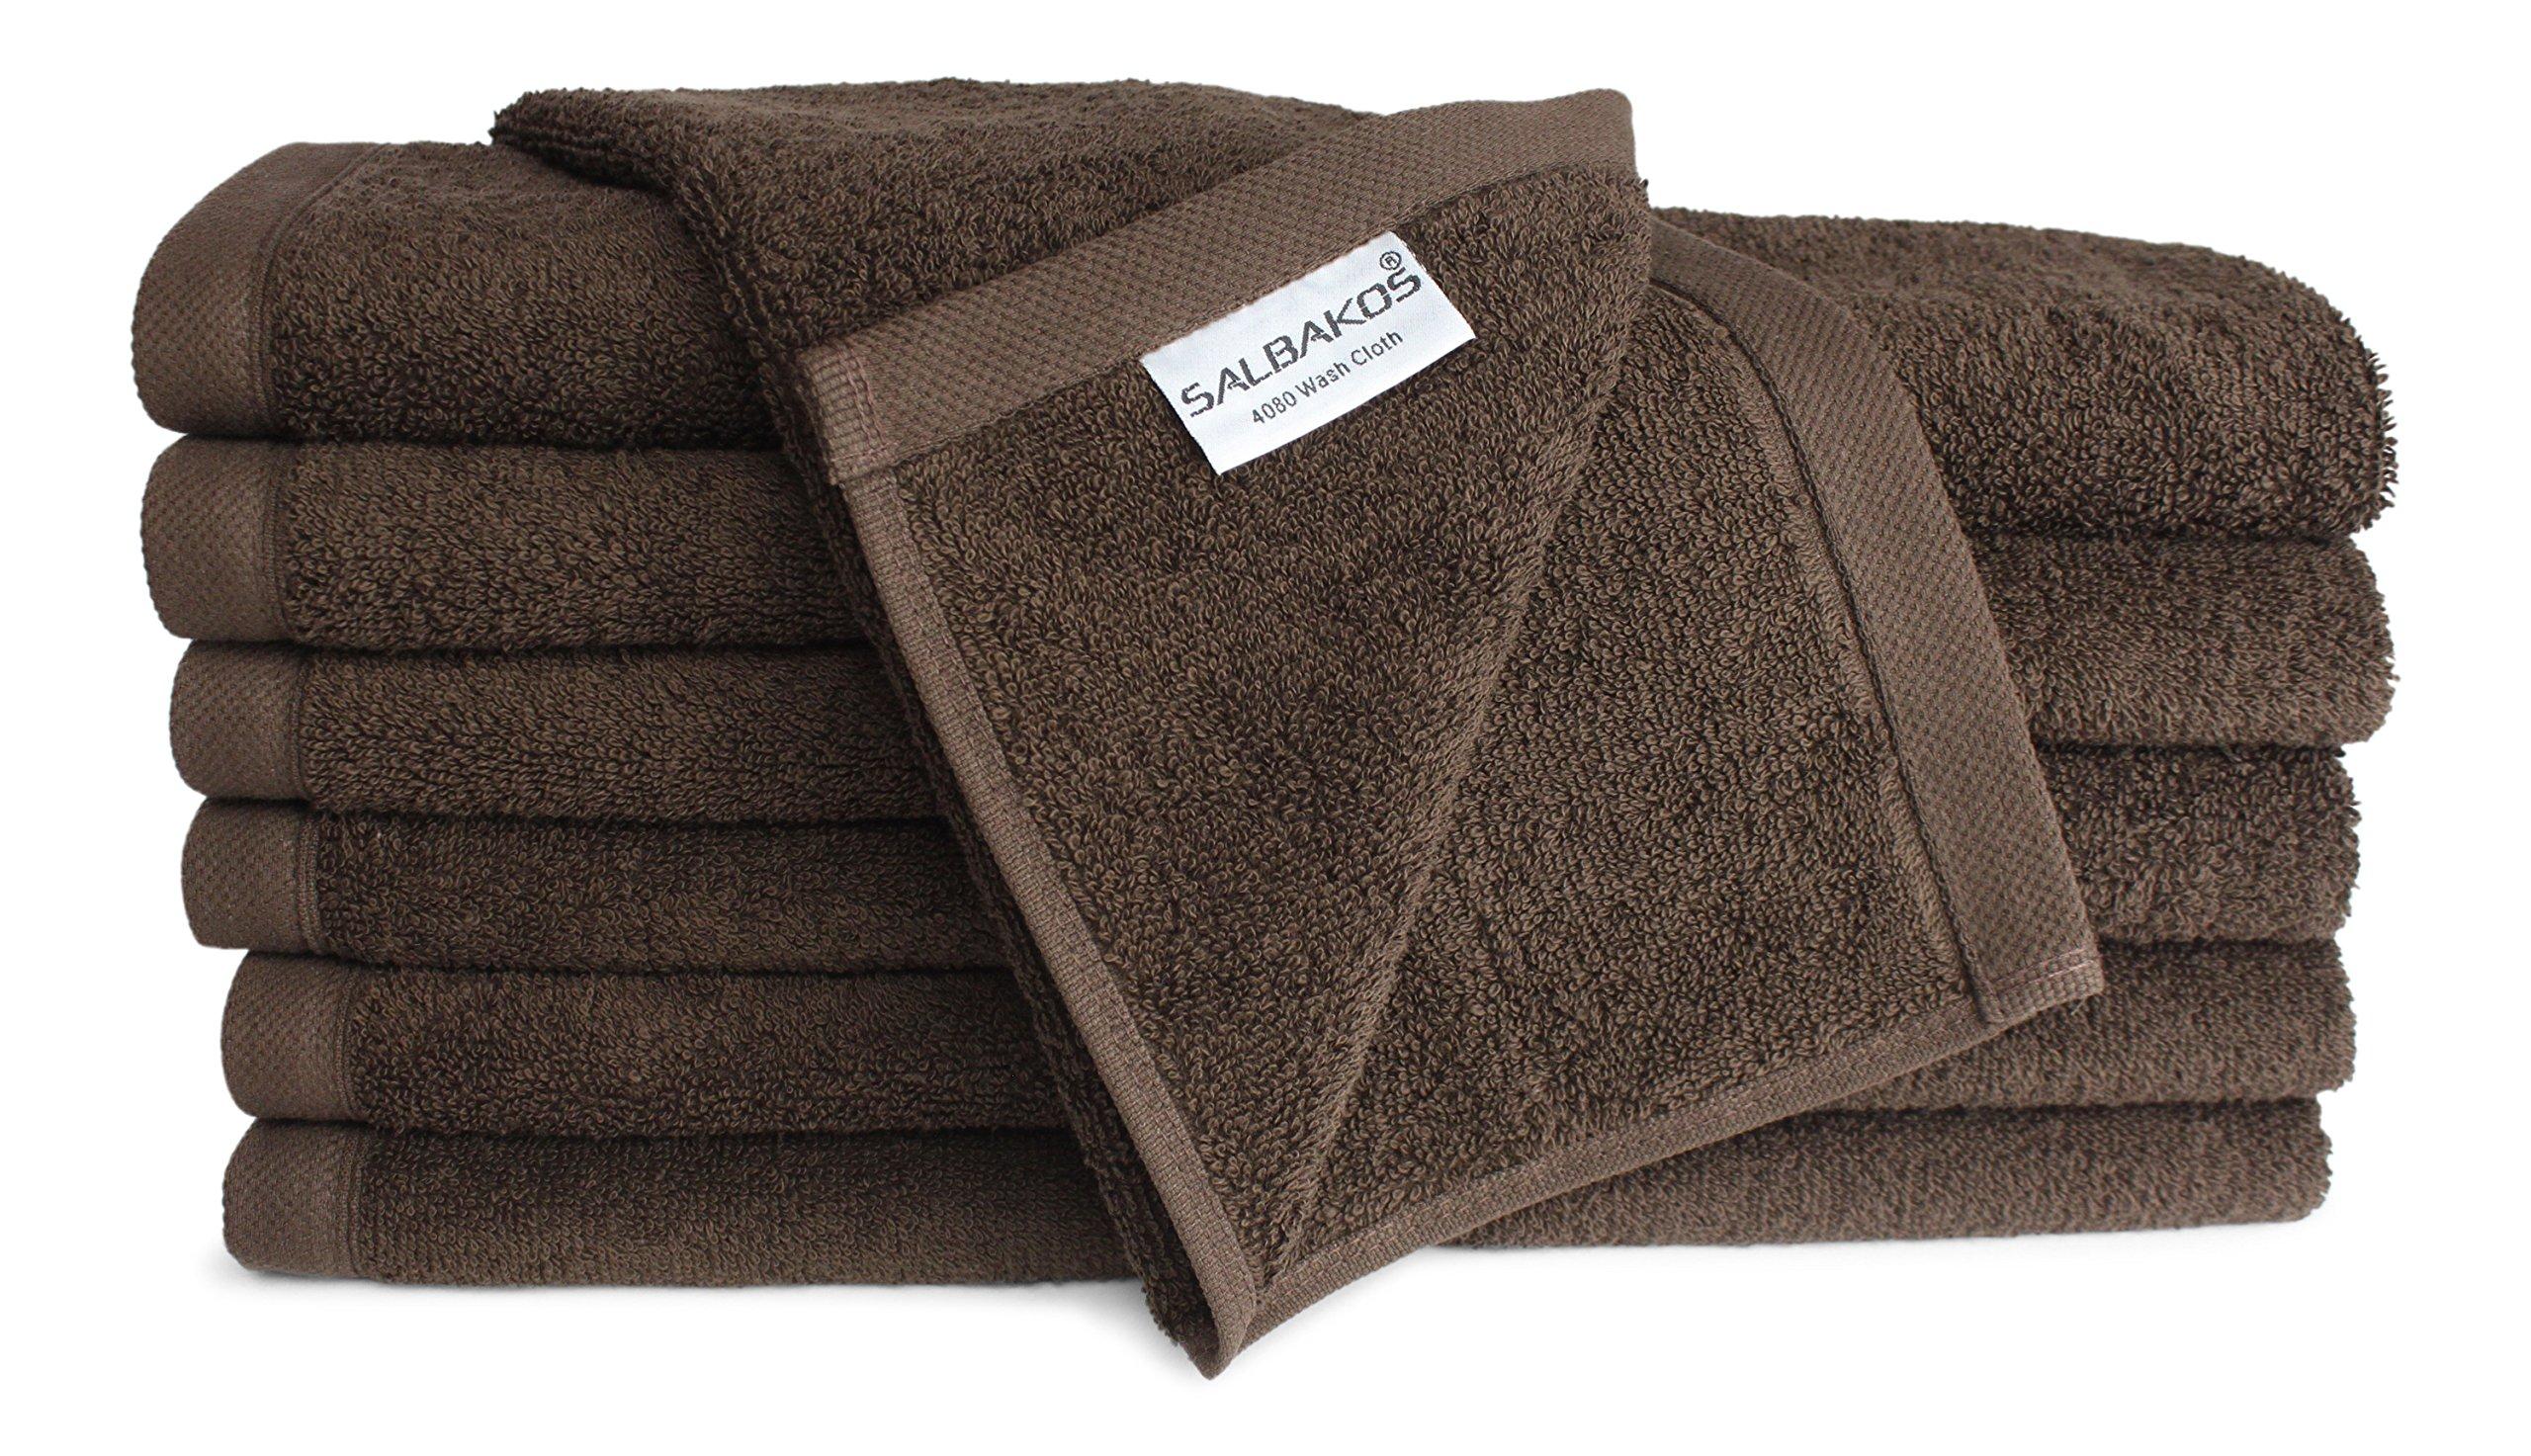 SALBAKOS Luxury Hotel & Spa Turkish Cotton 12-Piece Eco-Friendly Washcloth Set Bath, Chocolate